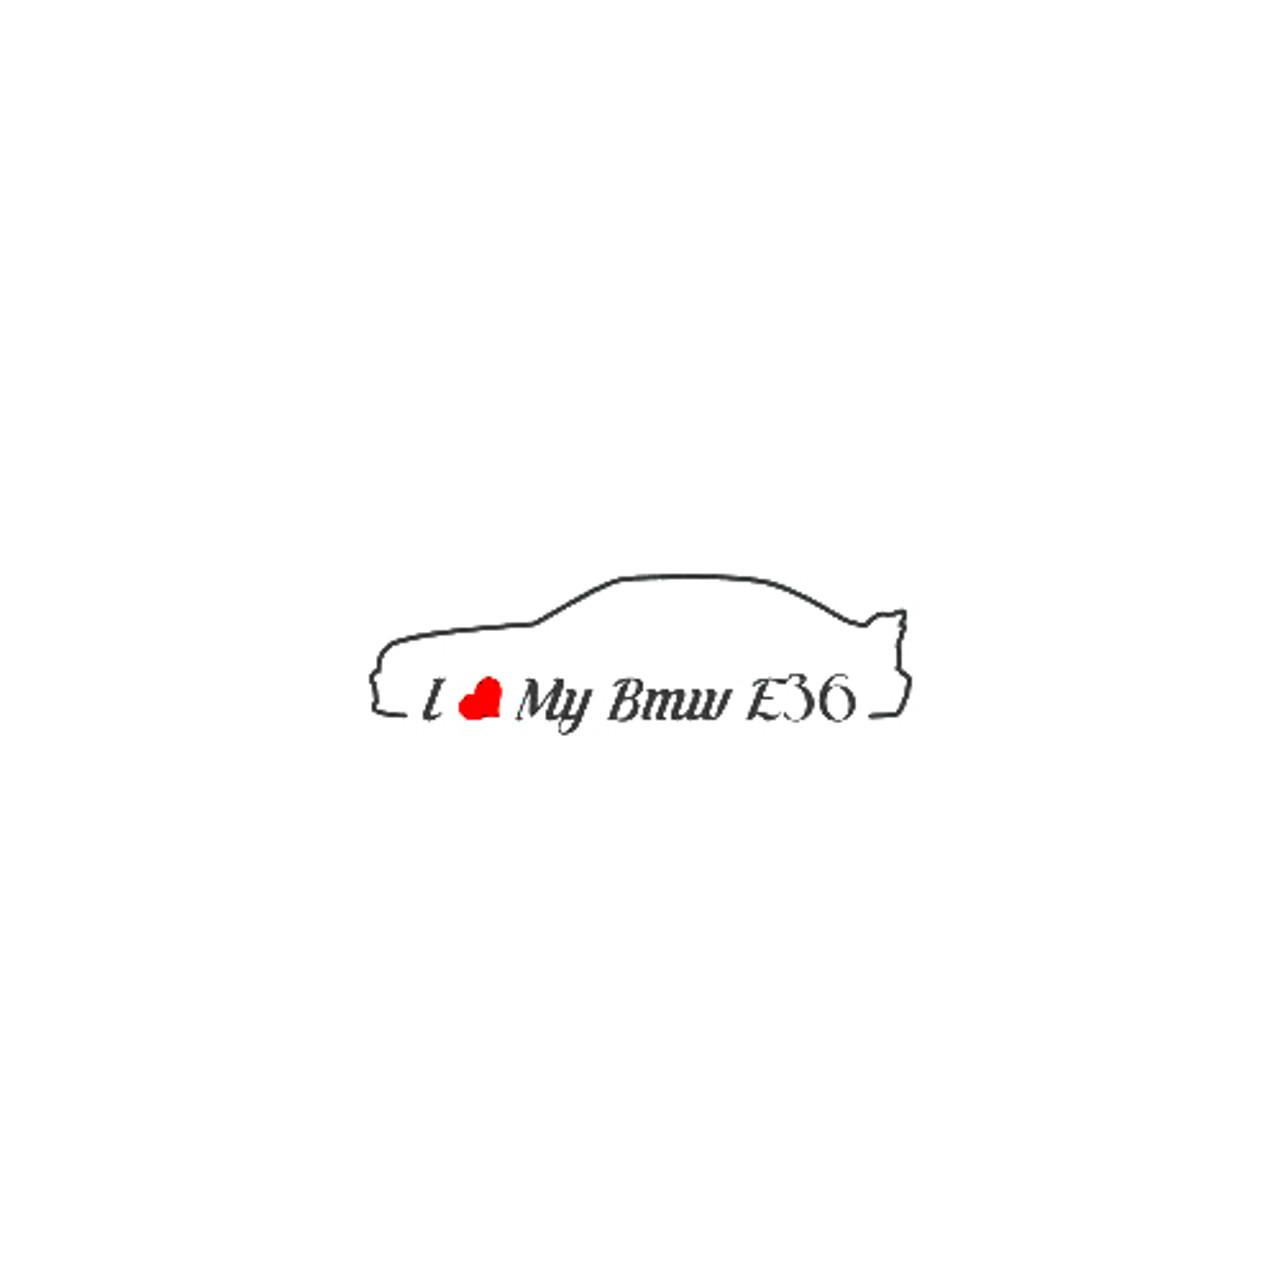 Jdm I Love My Bmw E36 Vinyl Decal